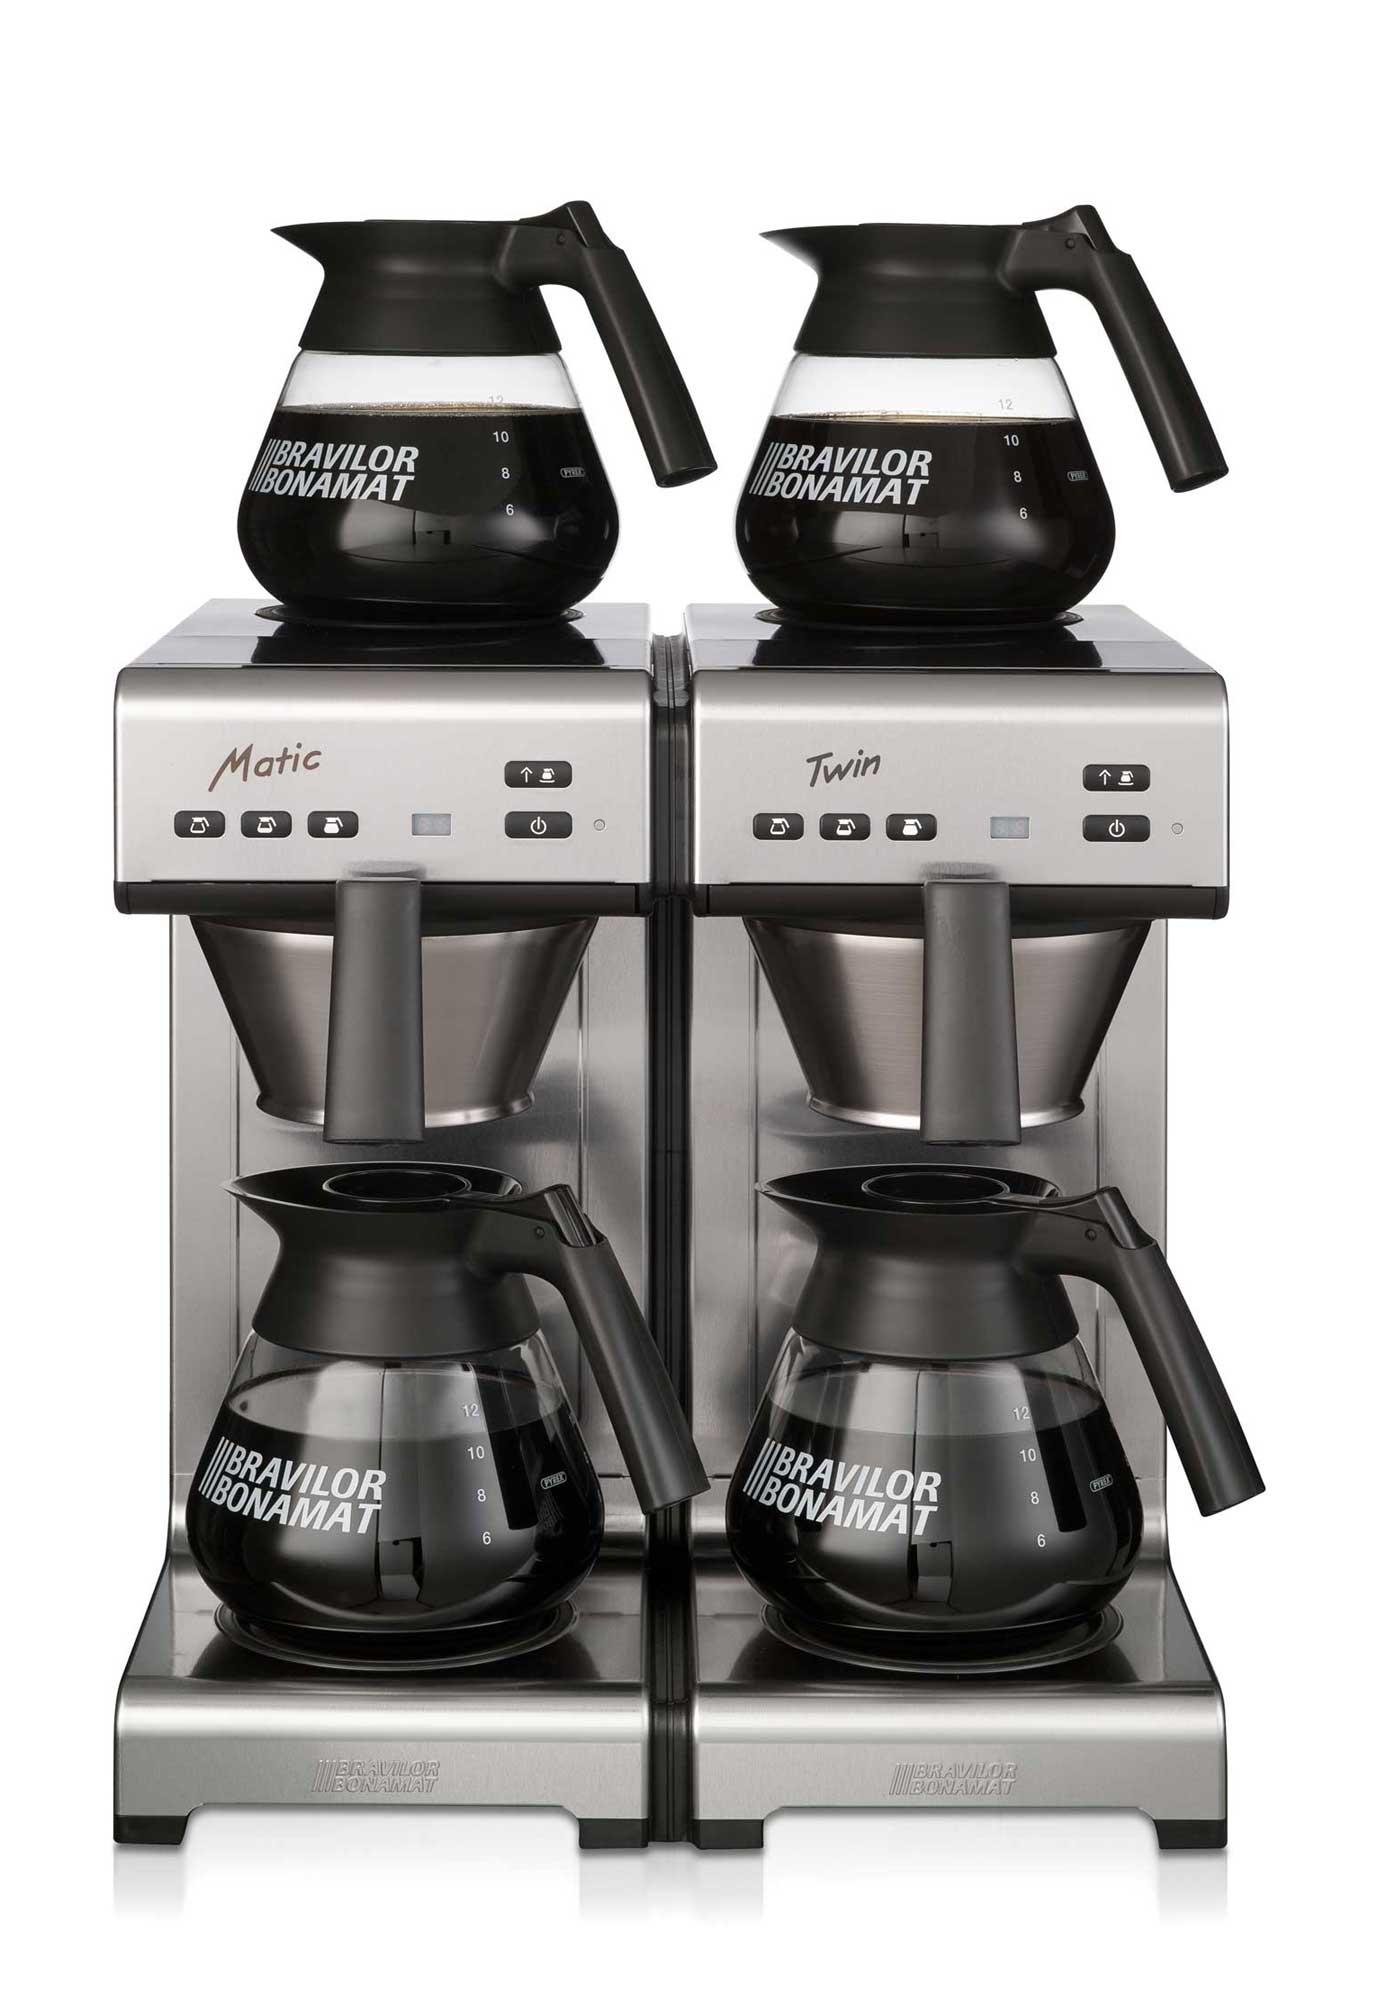 Bravilor Bonamat Matic Twin Filterkaffeemaschine, 230V od. 400V